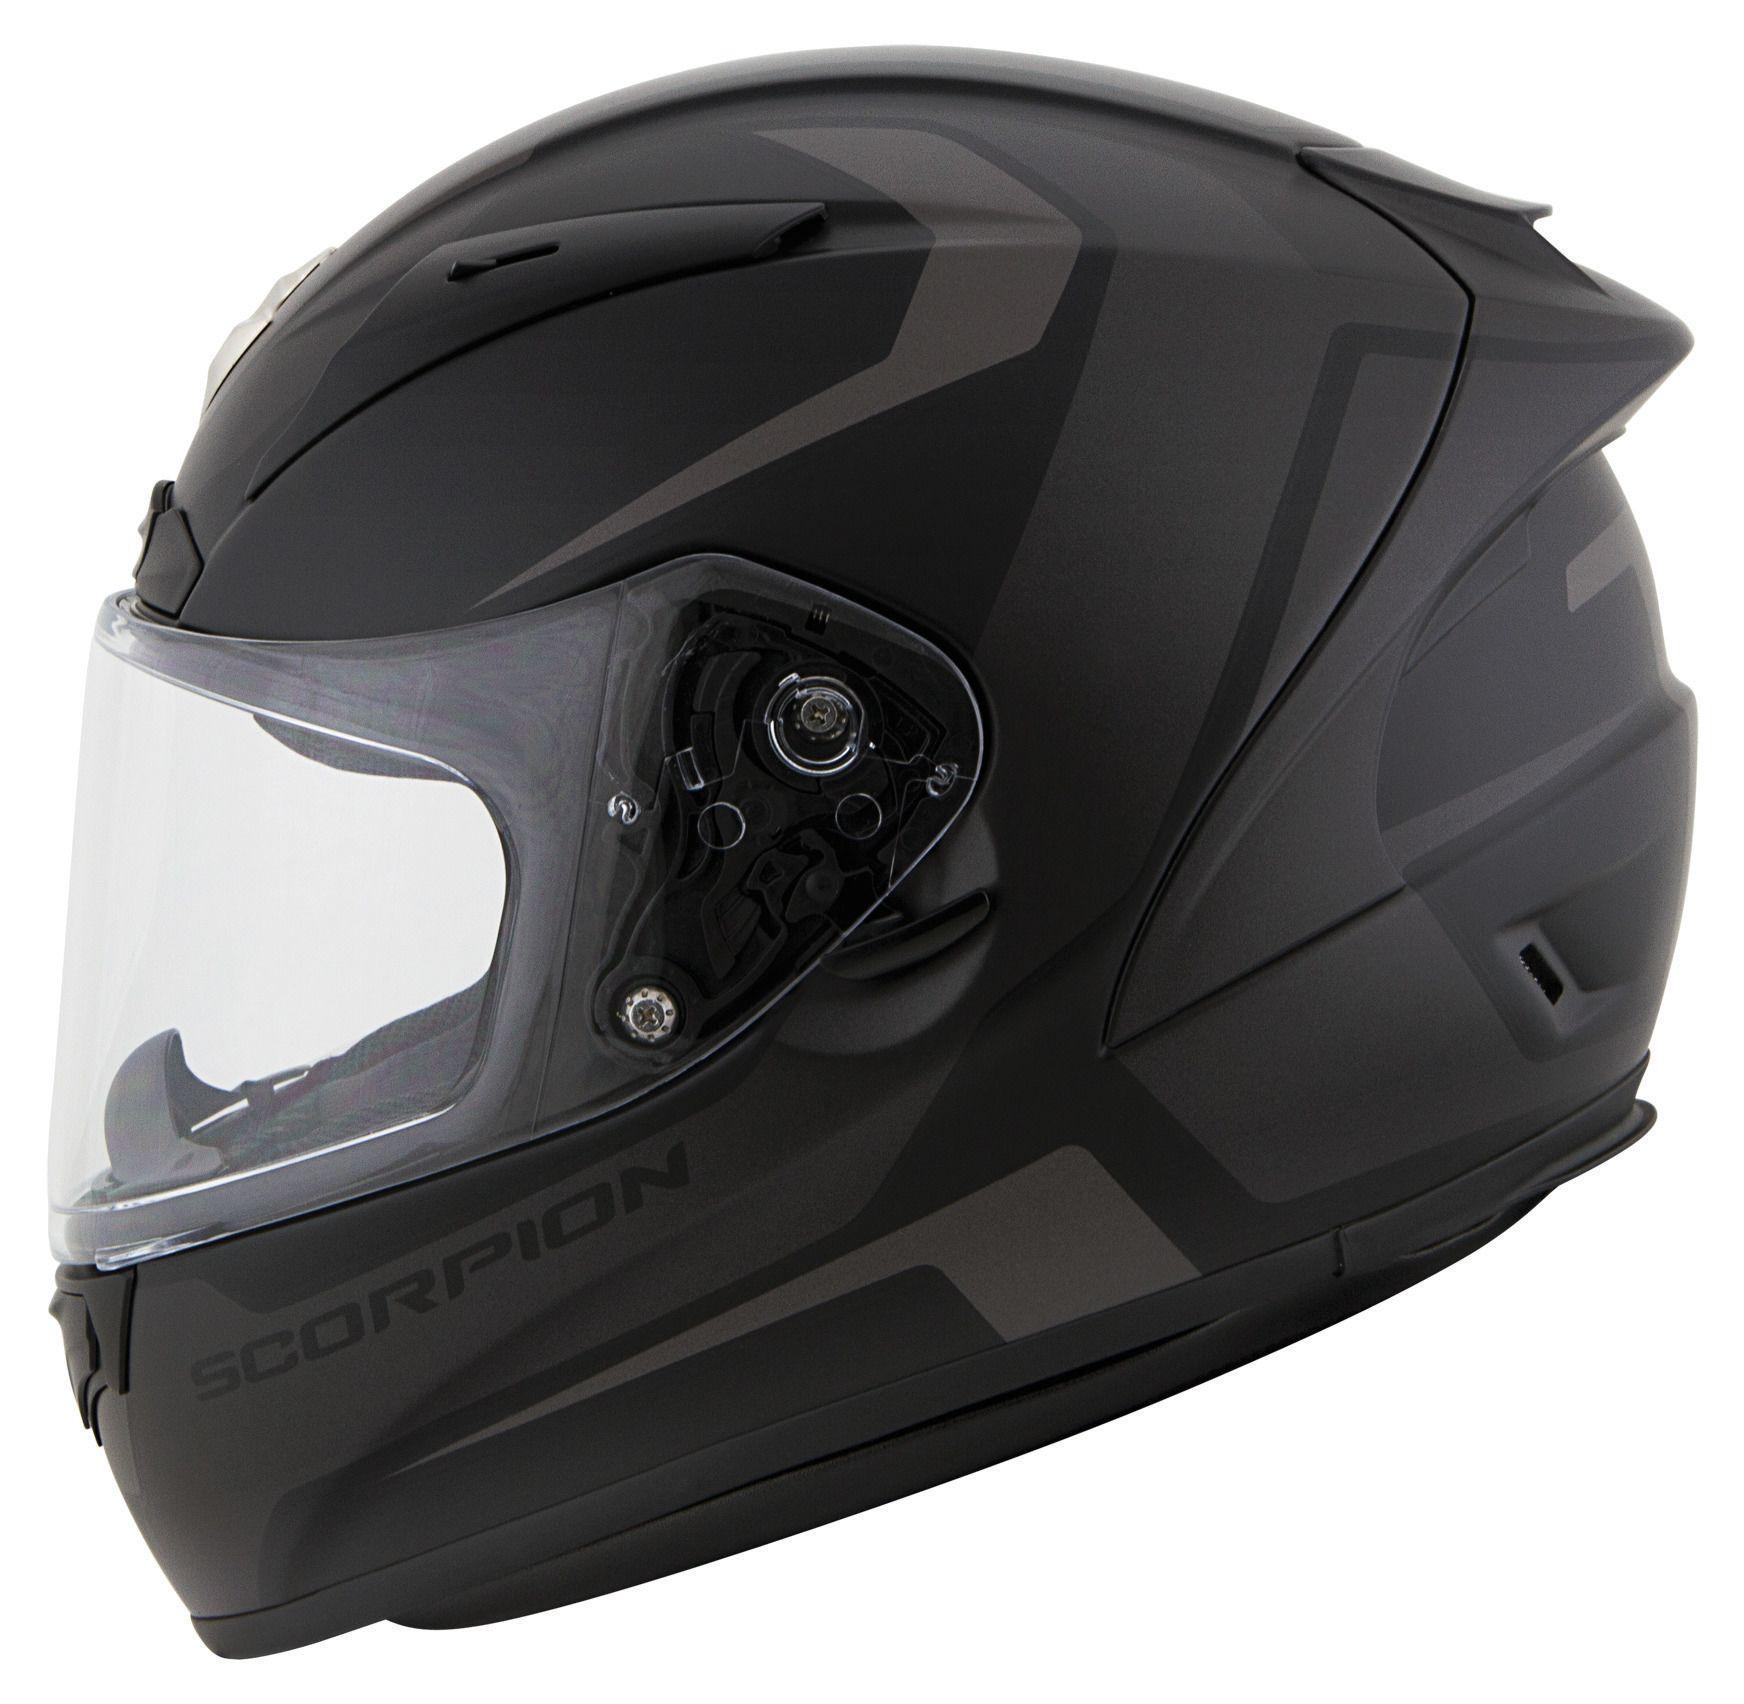 scorpion exo r2000 dispatch helmet revzilla. Black Bedroom Furniture Sets. Home Design Ideas